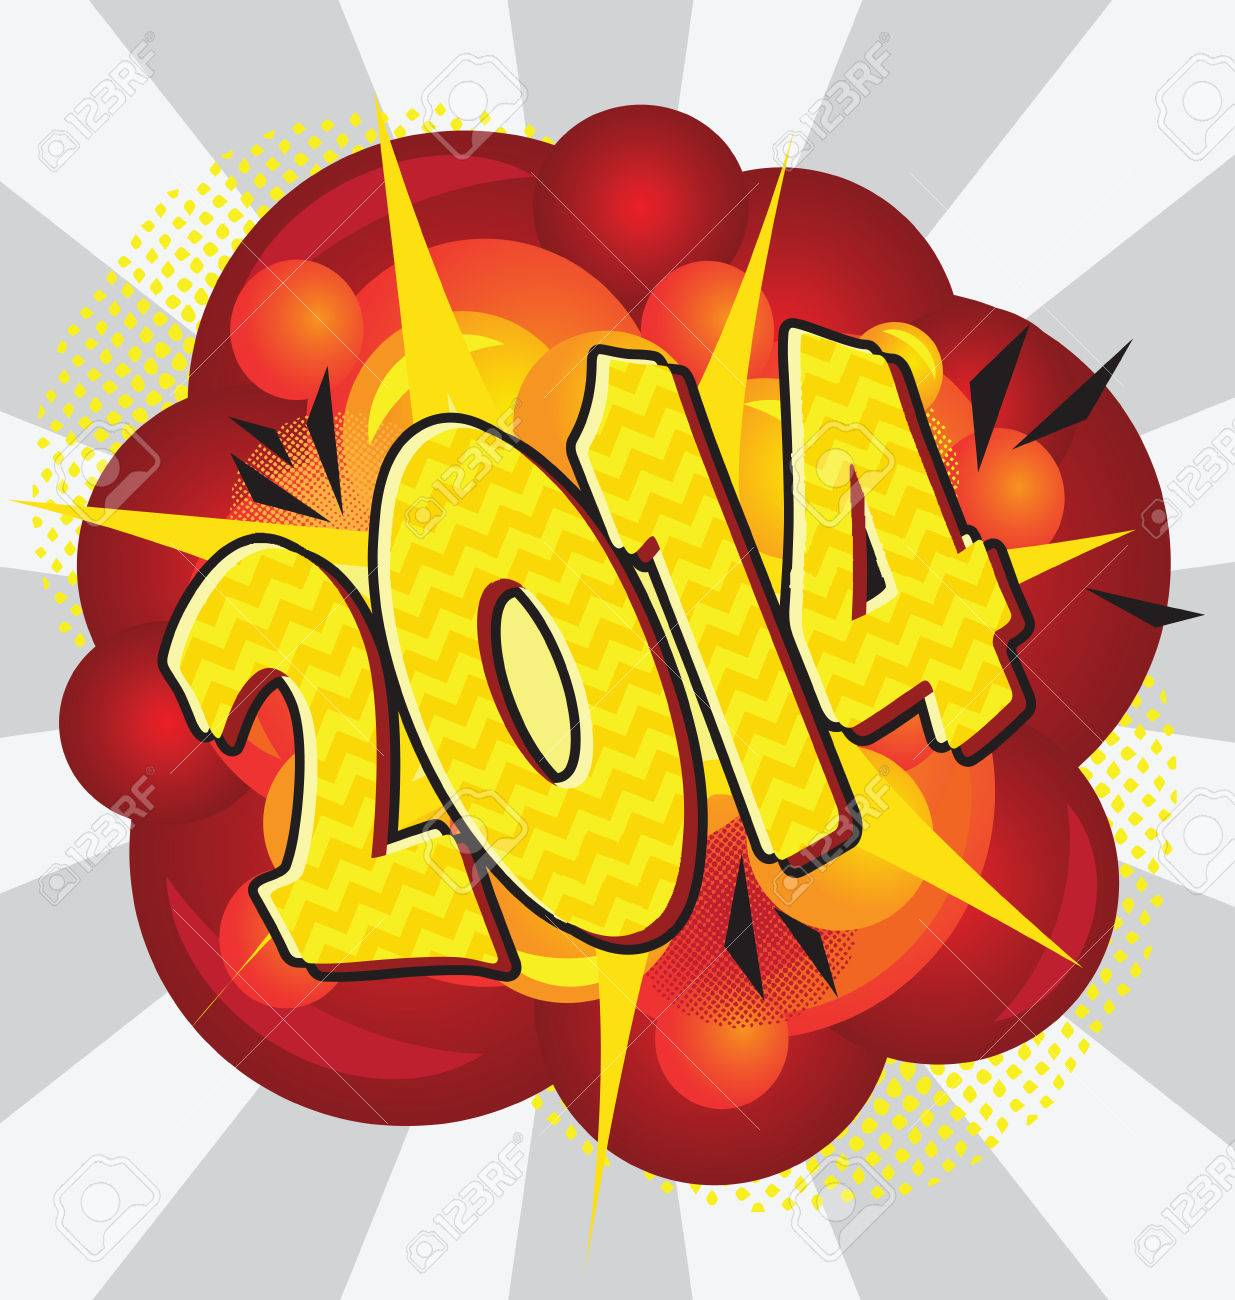 Cartoon explosion pop-art style – 2014. Stock Vector - 23291479